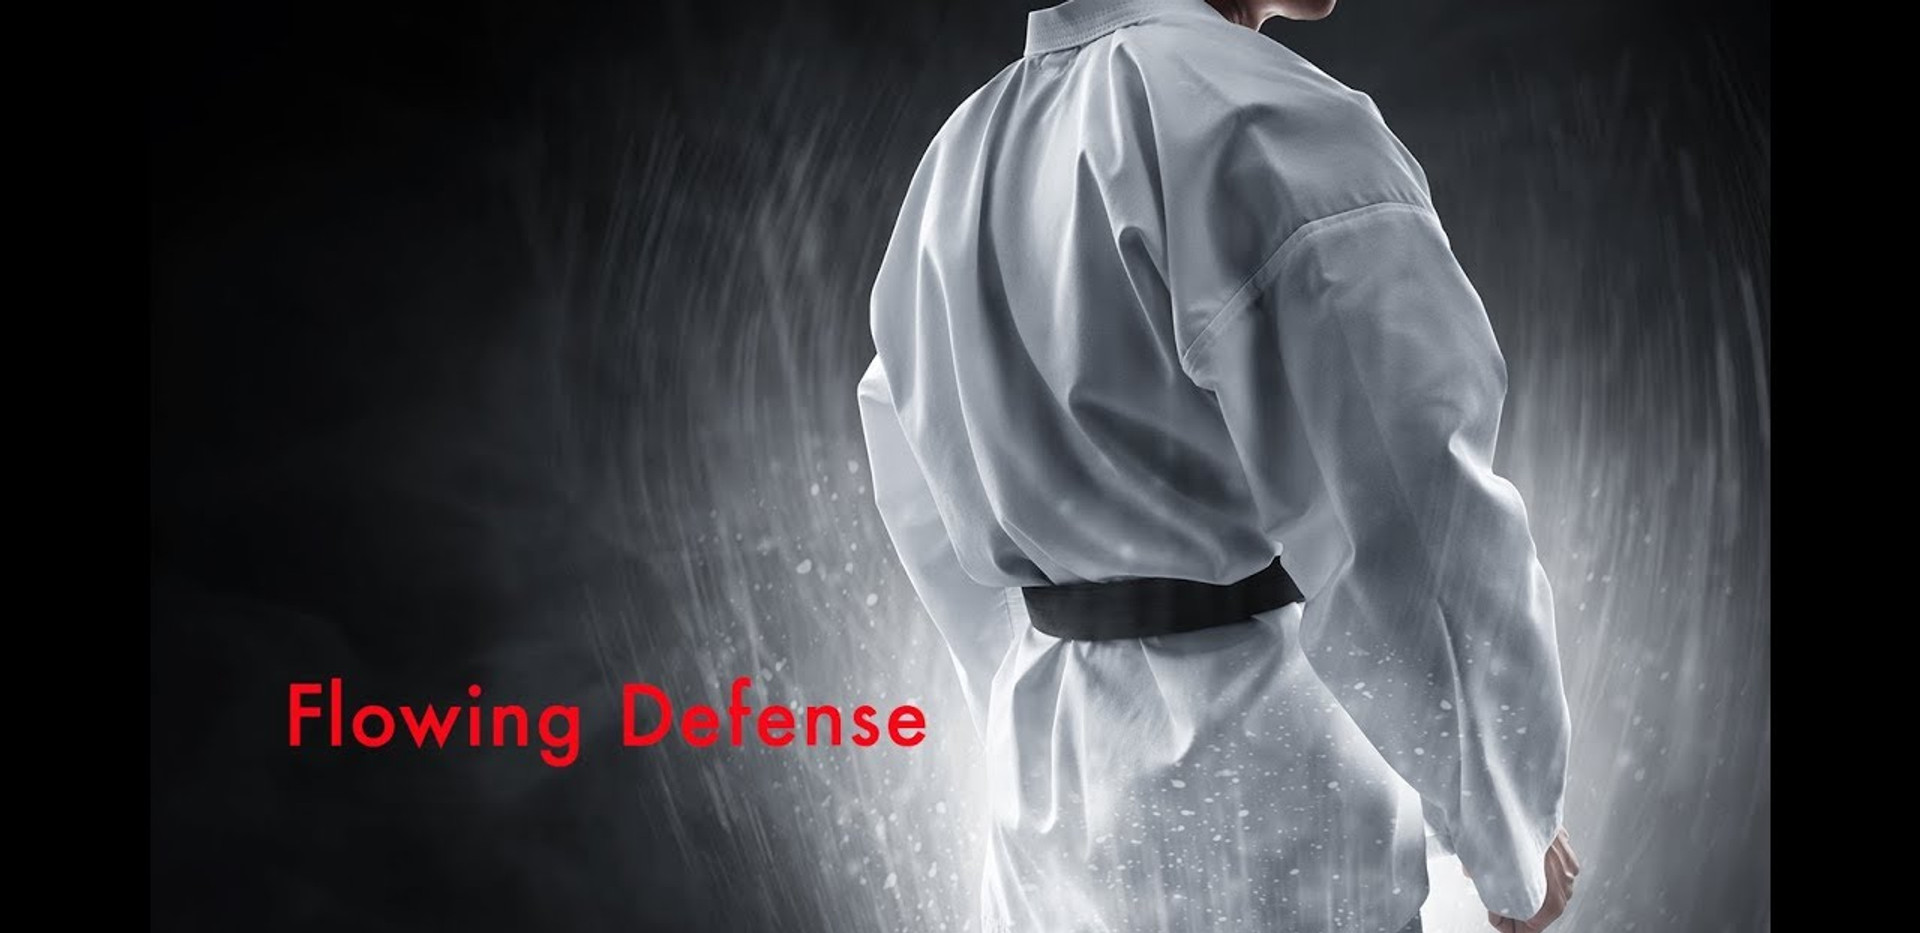 Flowing Defense